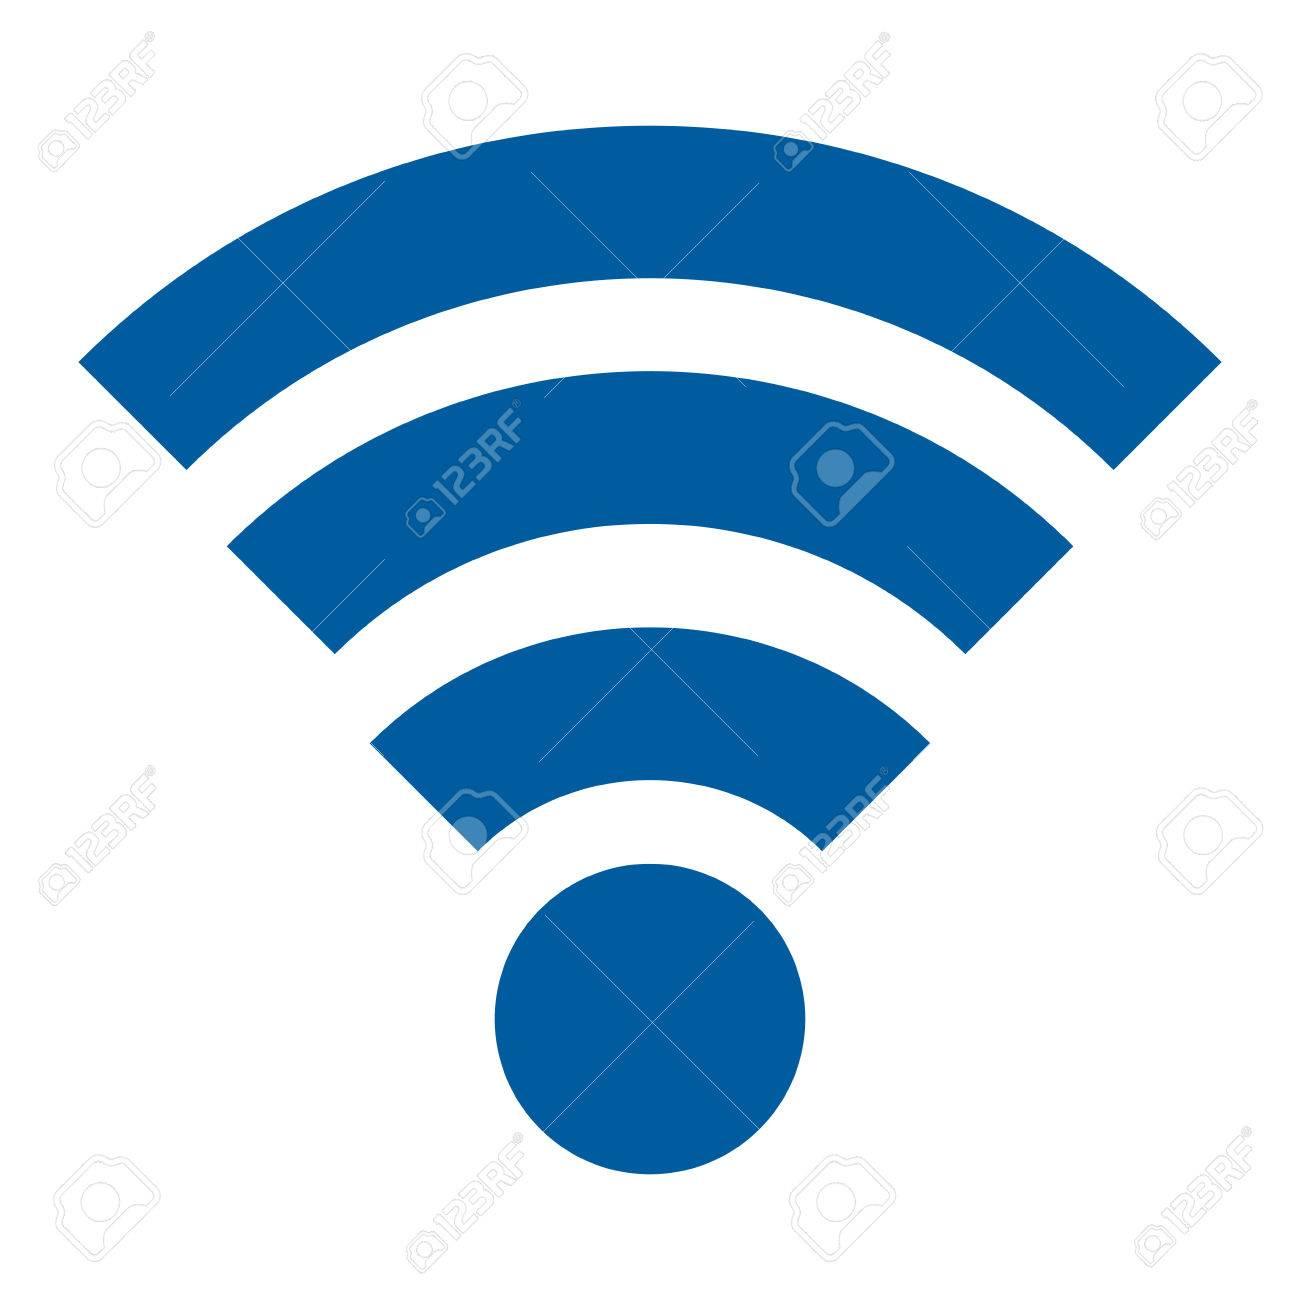 wifi signal isolated icon vector illustration design - 81137915